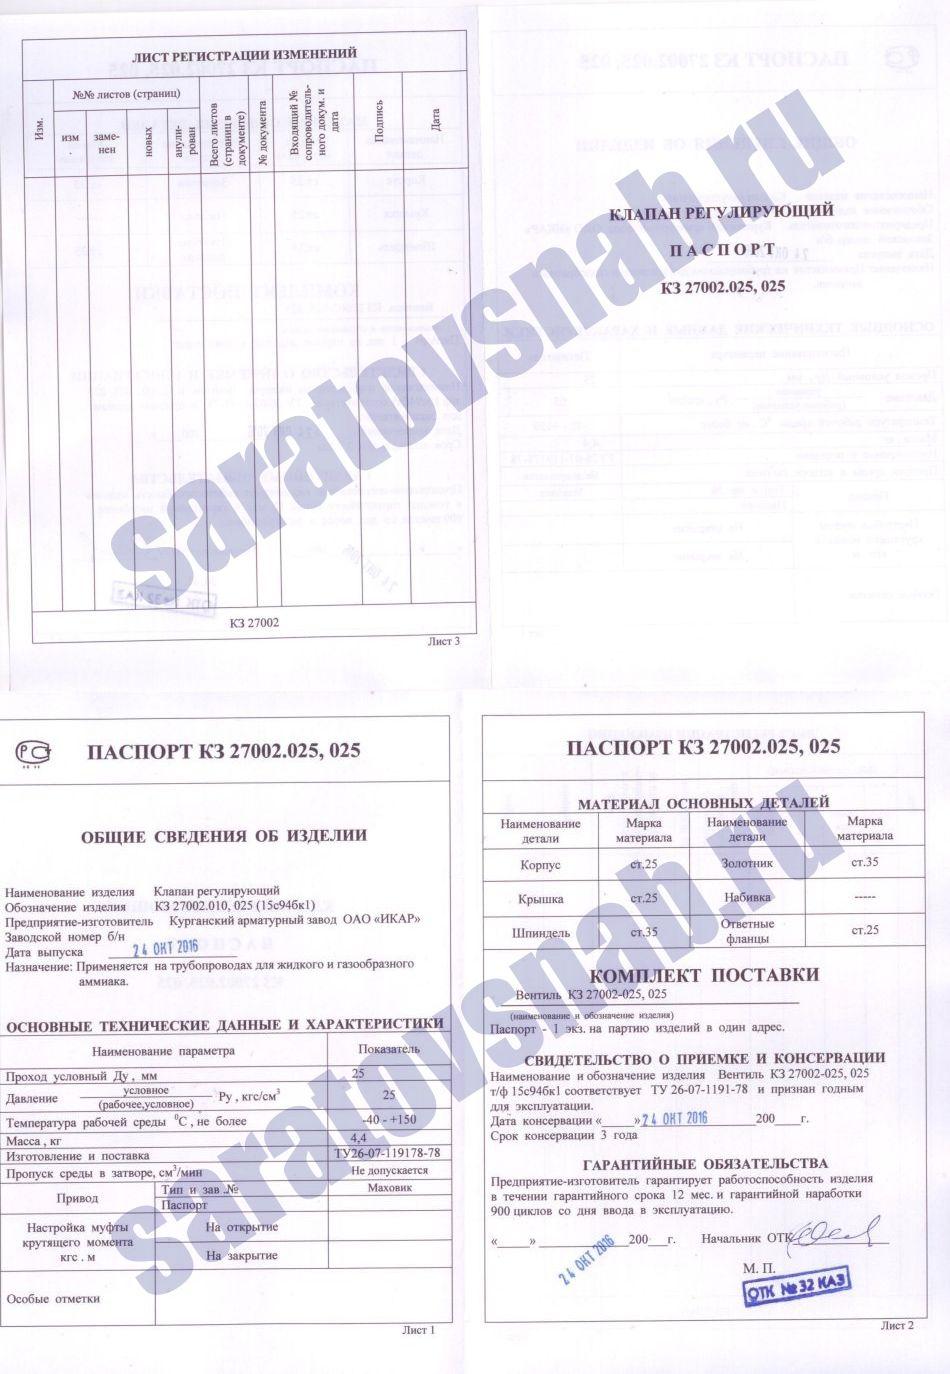 pasport_15s94bk